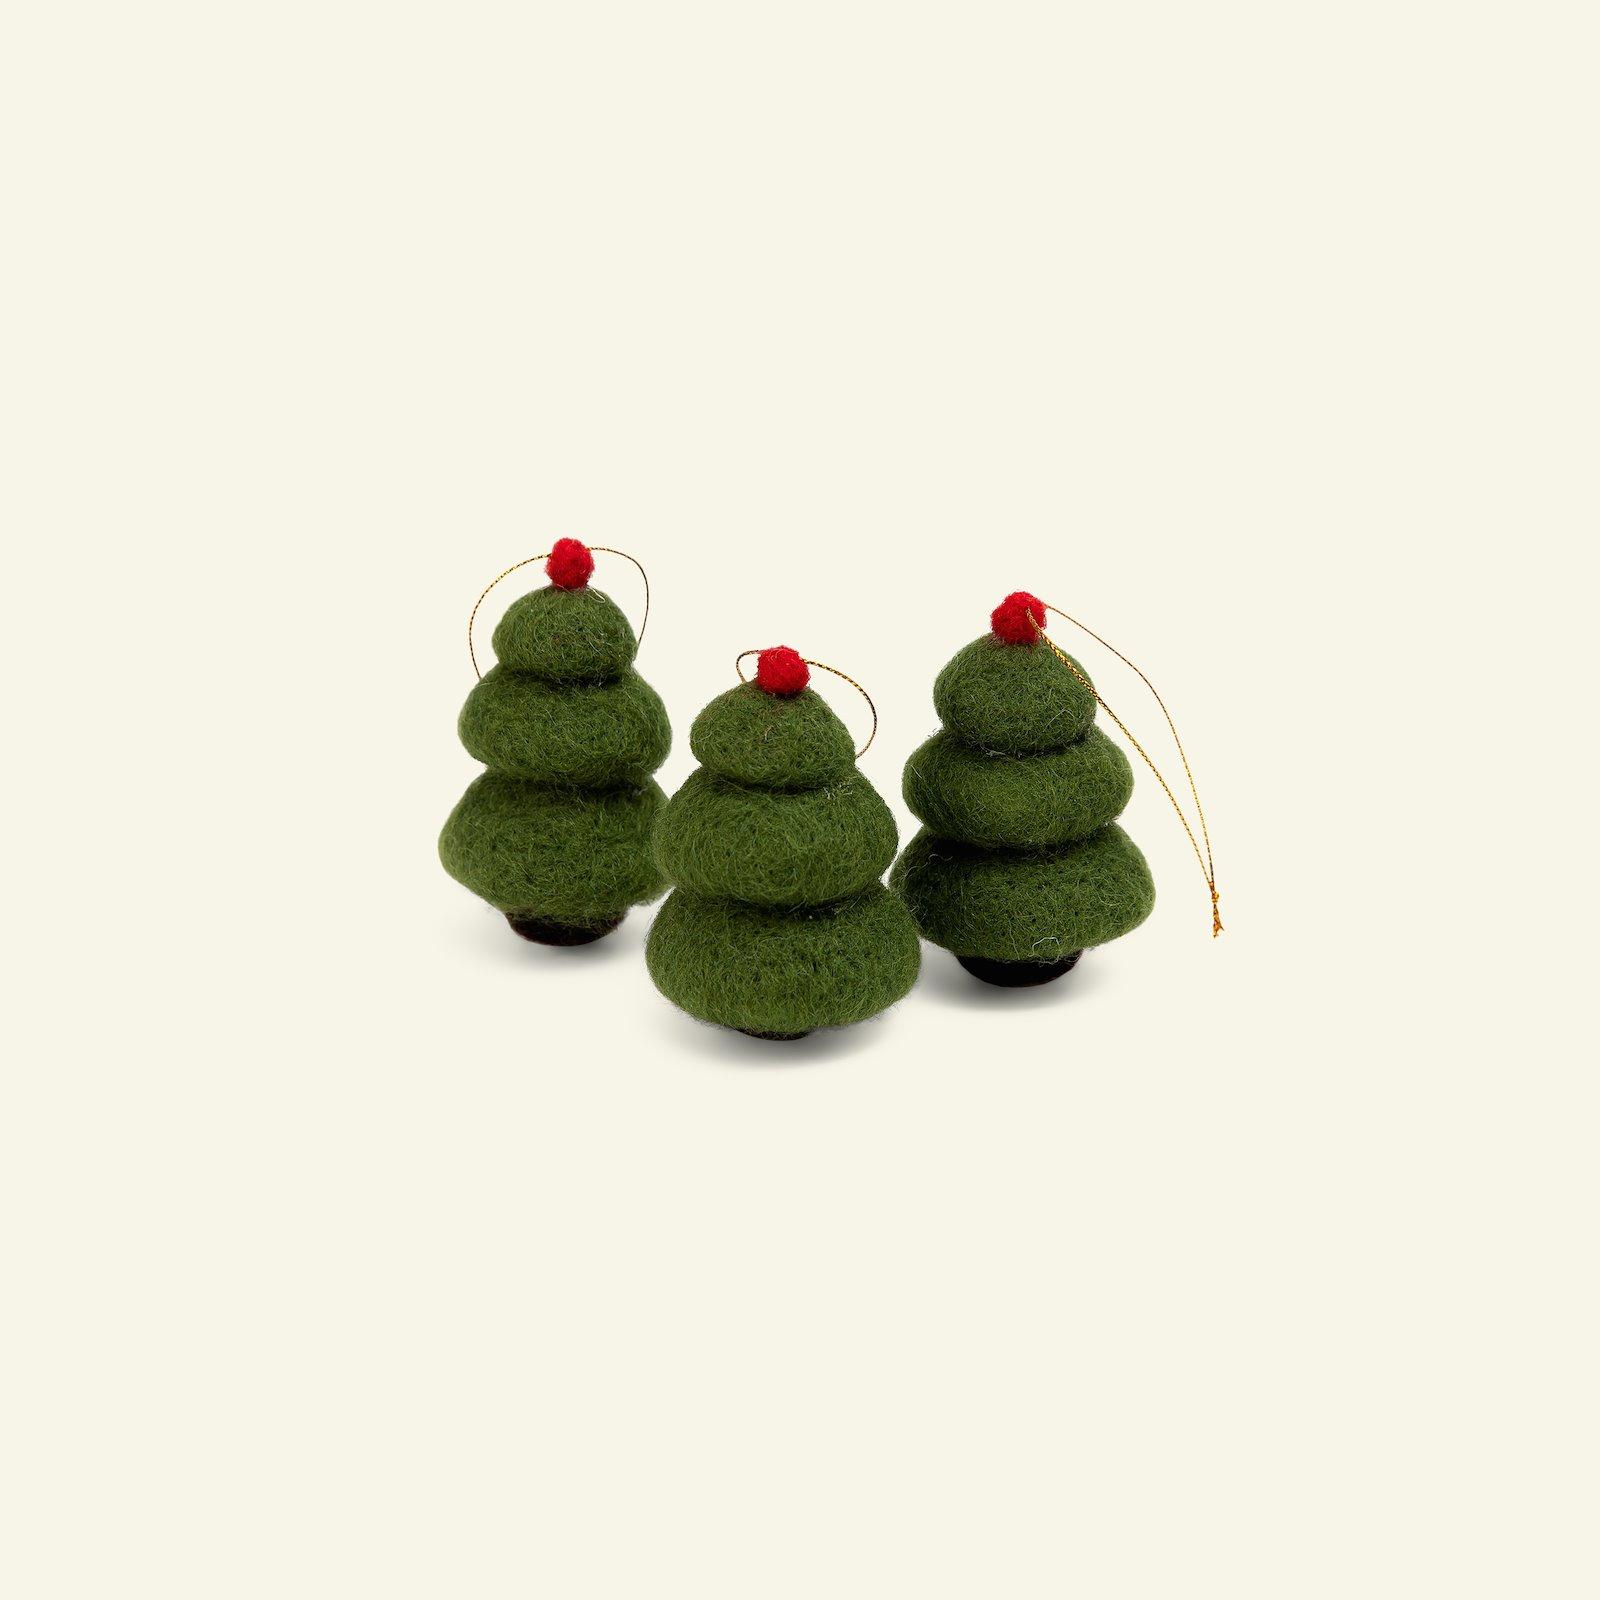 Kit wool tree 6cm green 3pcs 93790_pack